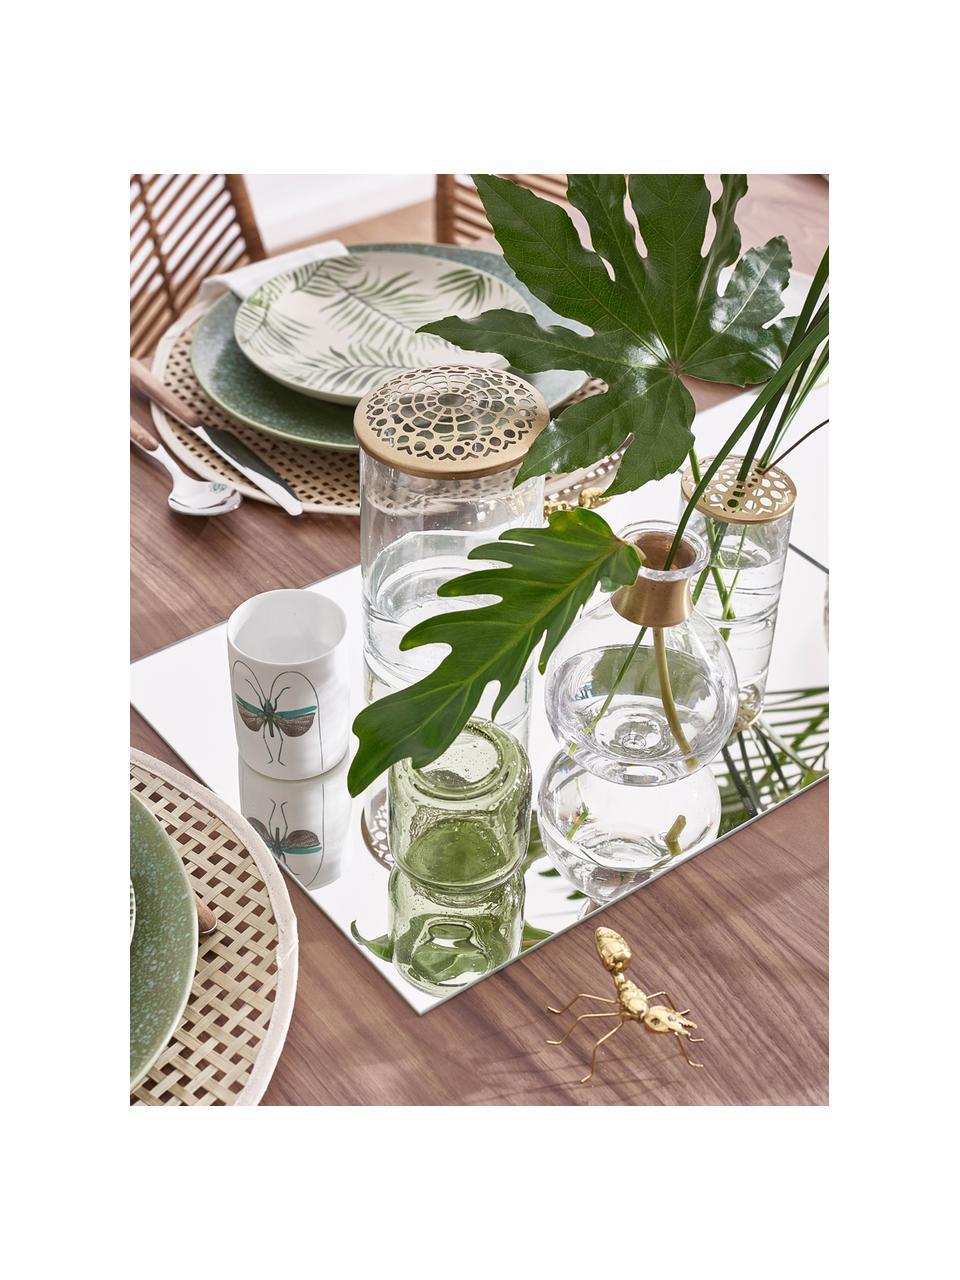 Vase Kassandra mit Messingdeckel, Vase: Glas, Deckel: Edelstahl, vermessingt, Vase: Transparent Deckel: Messing, Ø 10 x H 16 cm